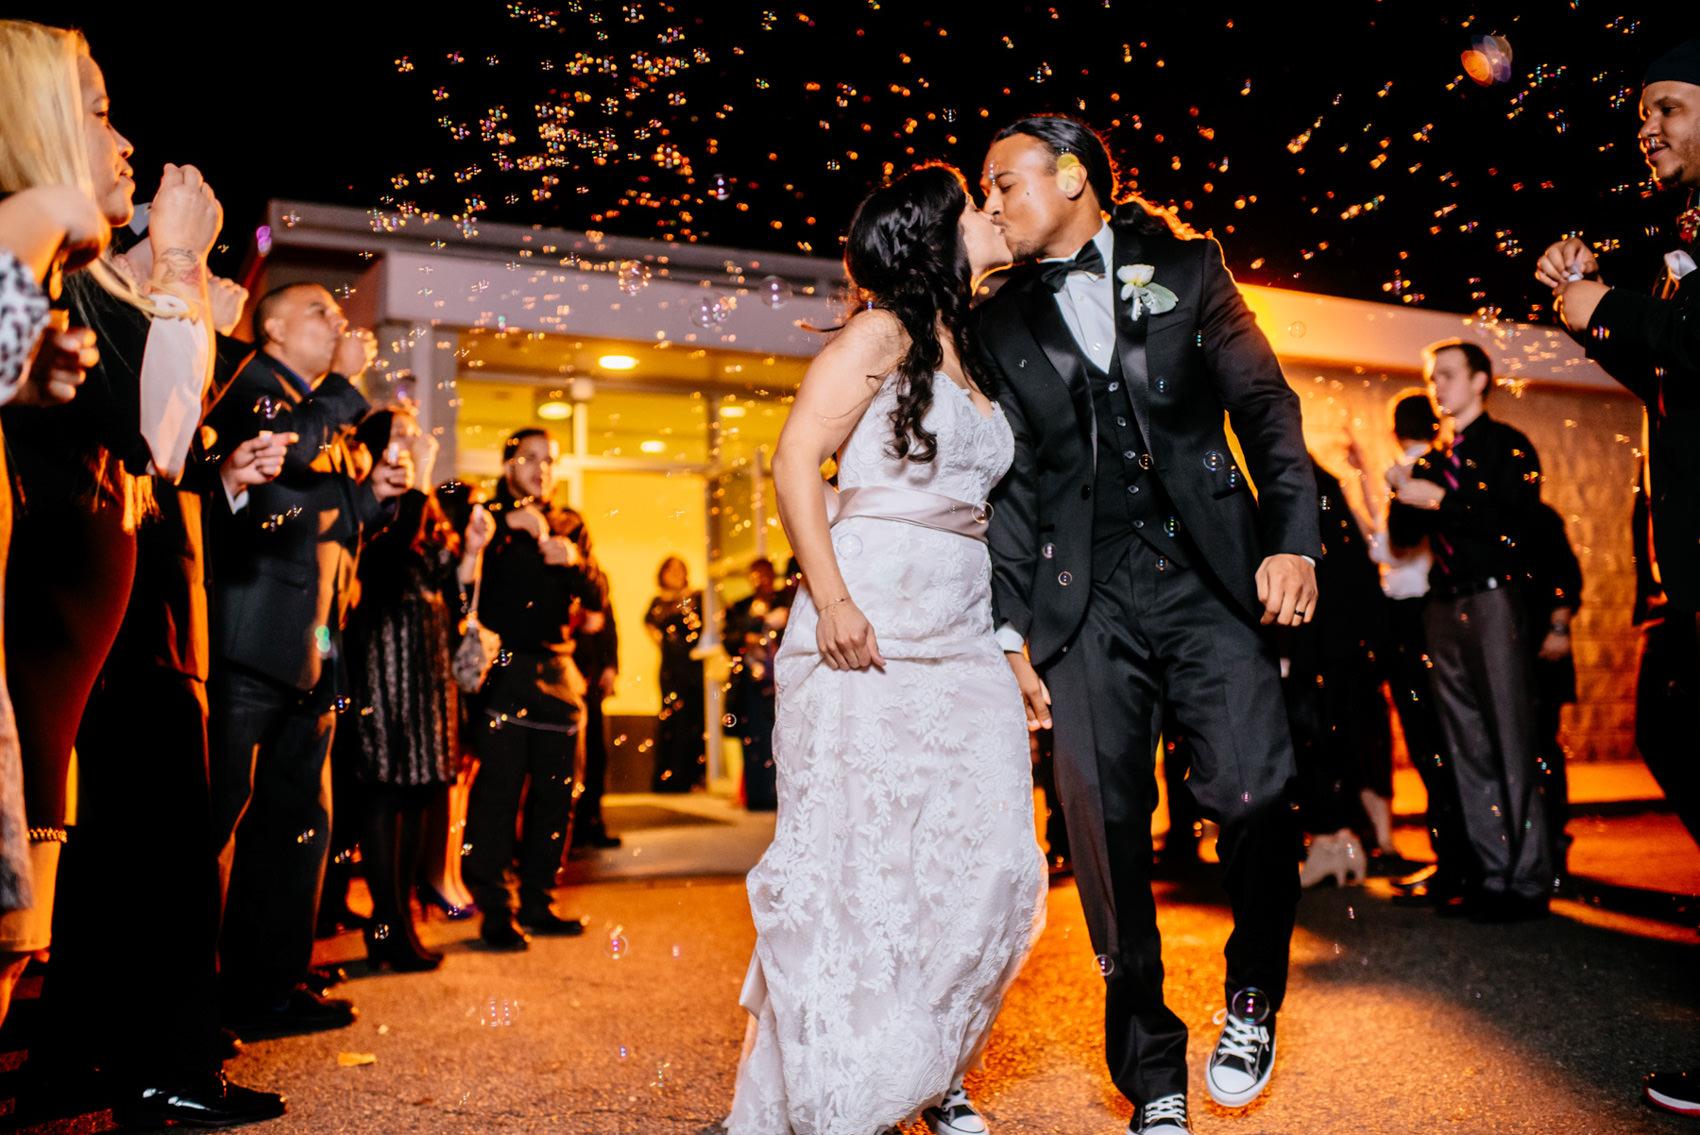 051-oberports-wedding-reception-portfolio